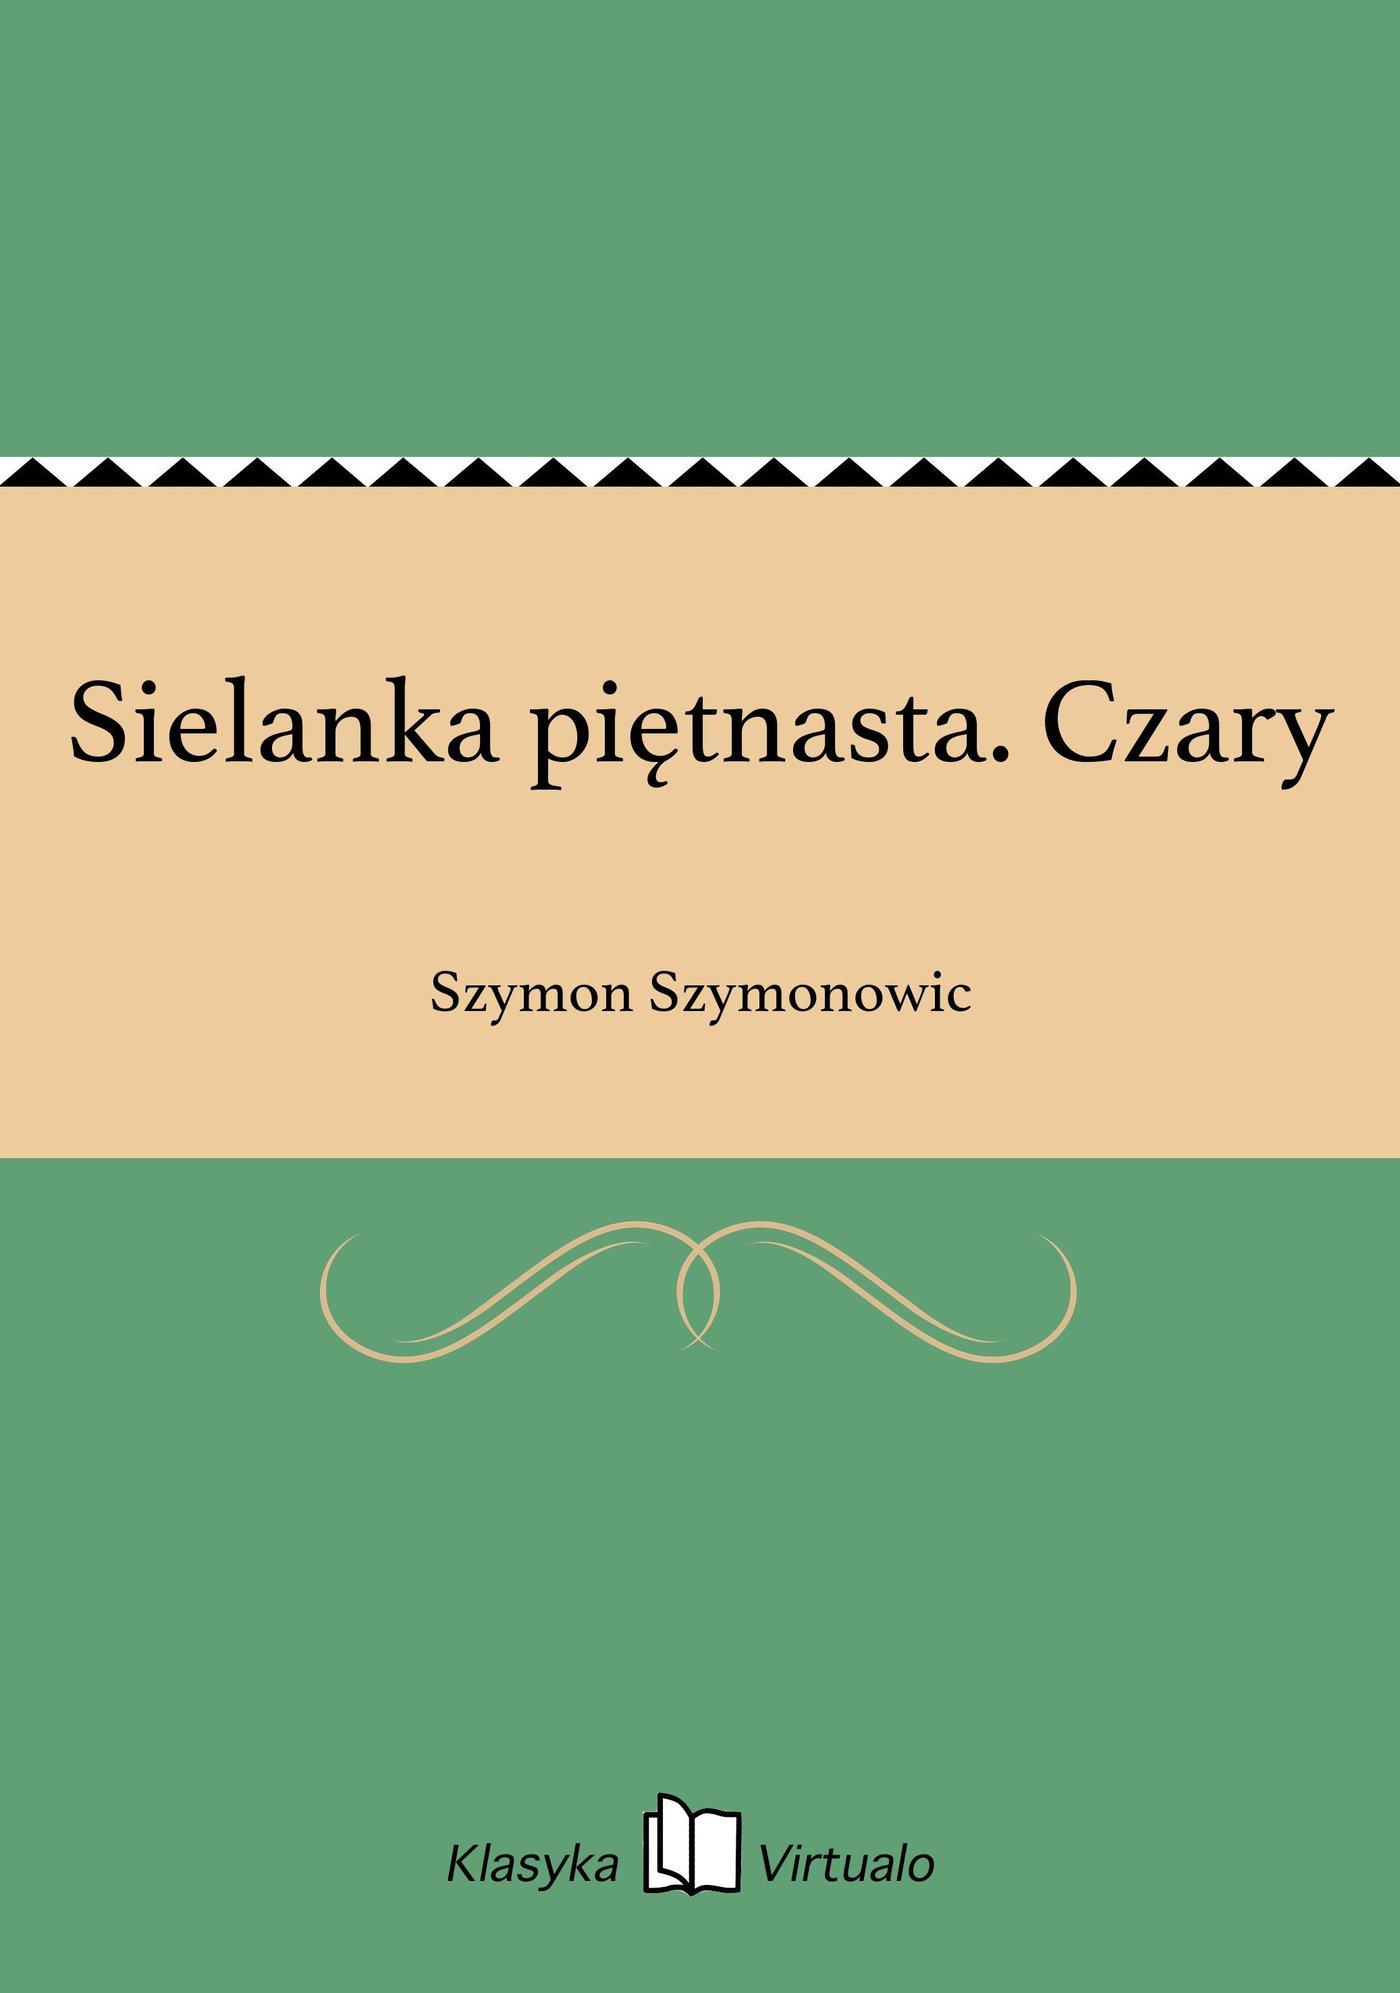 Sielanka piętnasta. Czary - Ebook (Książka na Kindle) do pobrania w formacie MOBI